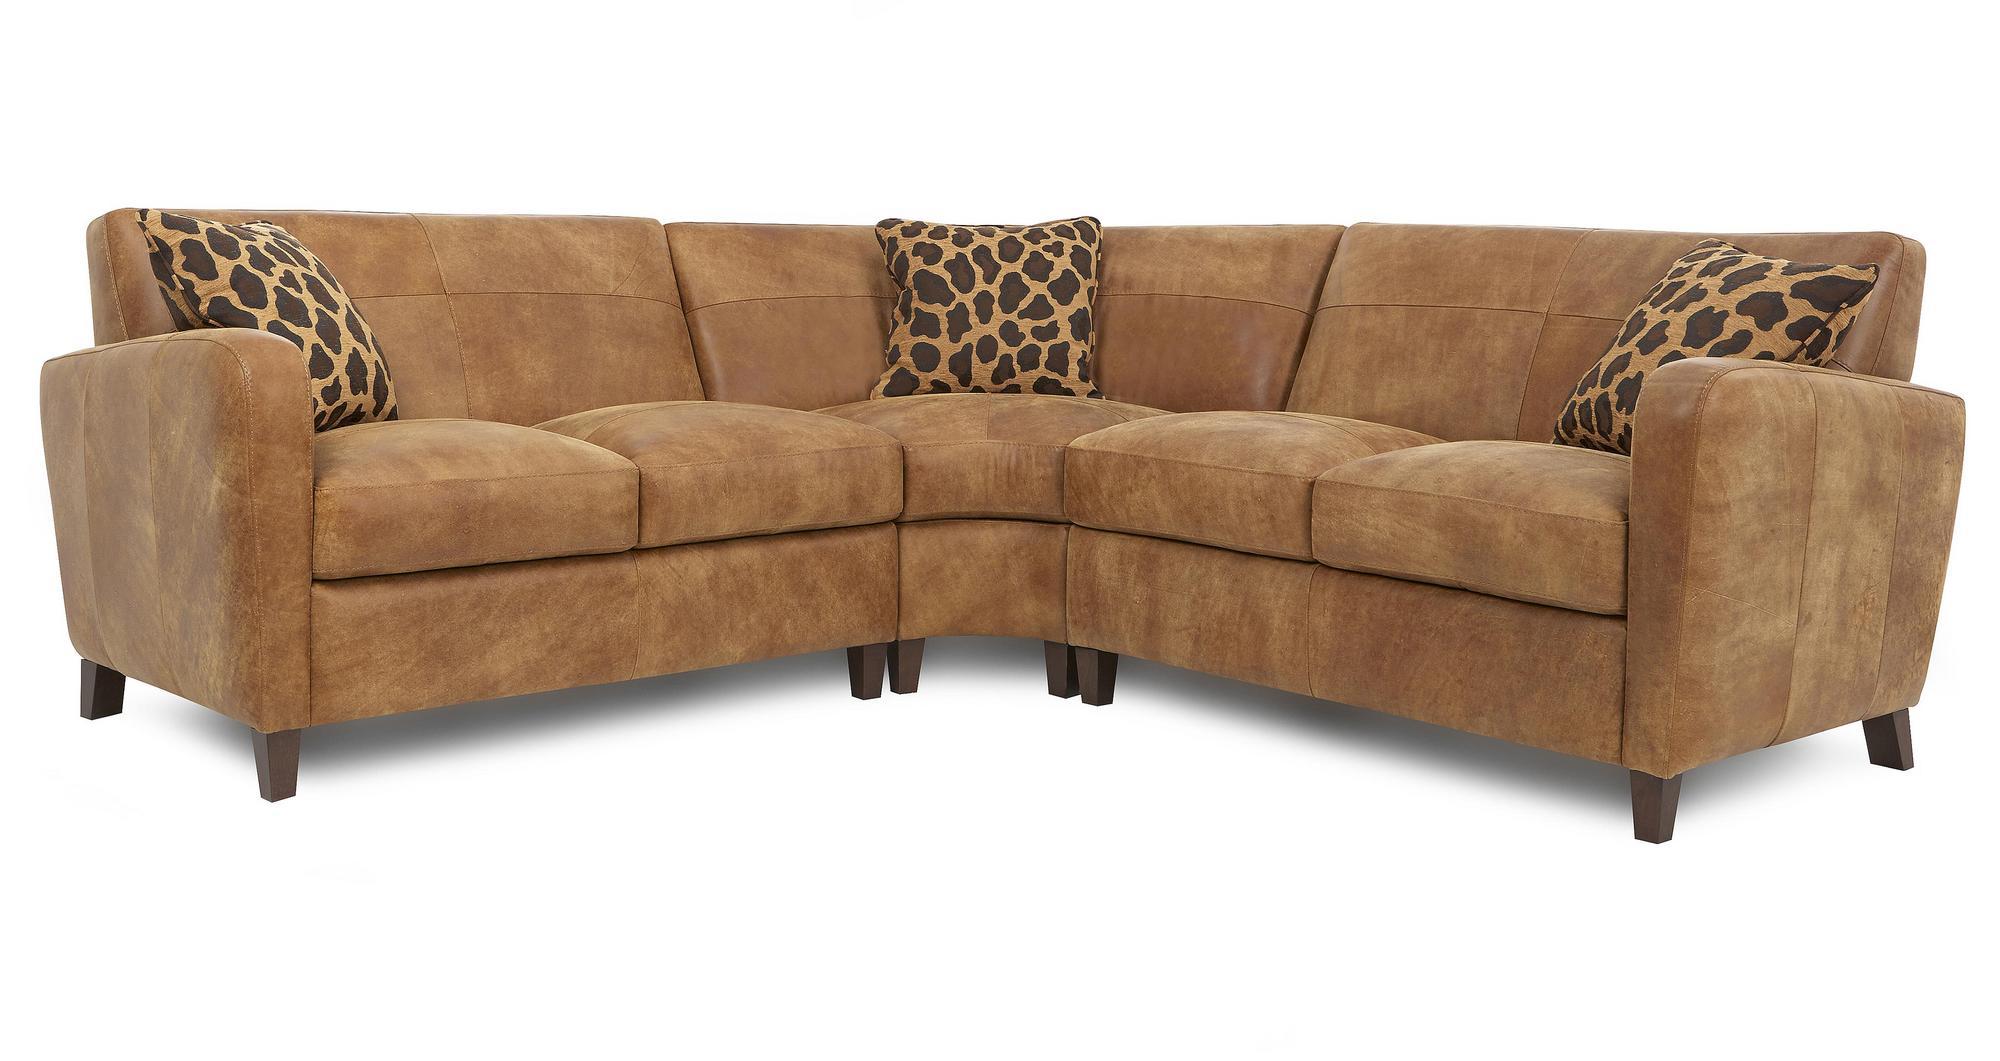 sofa half leather sleeper sale safari natural set inc corner armchair